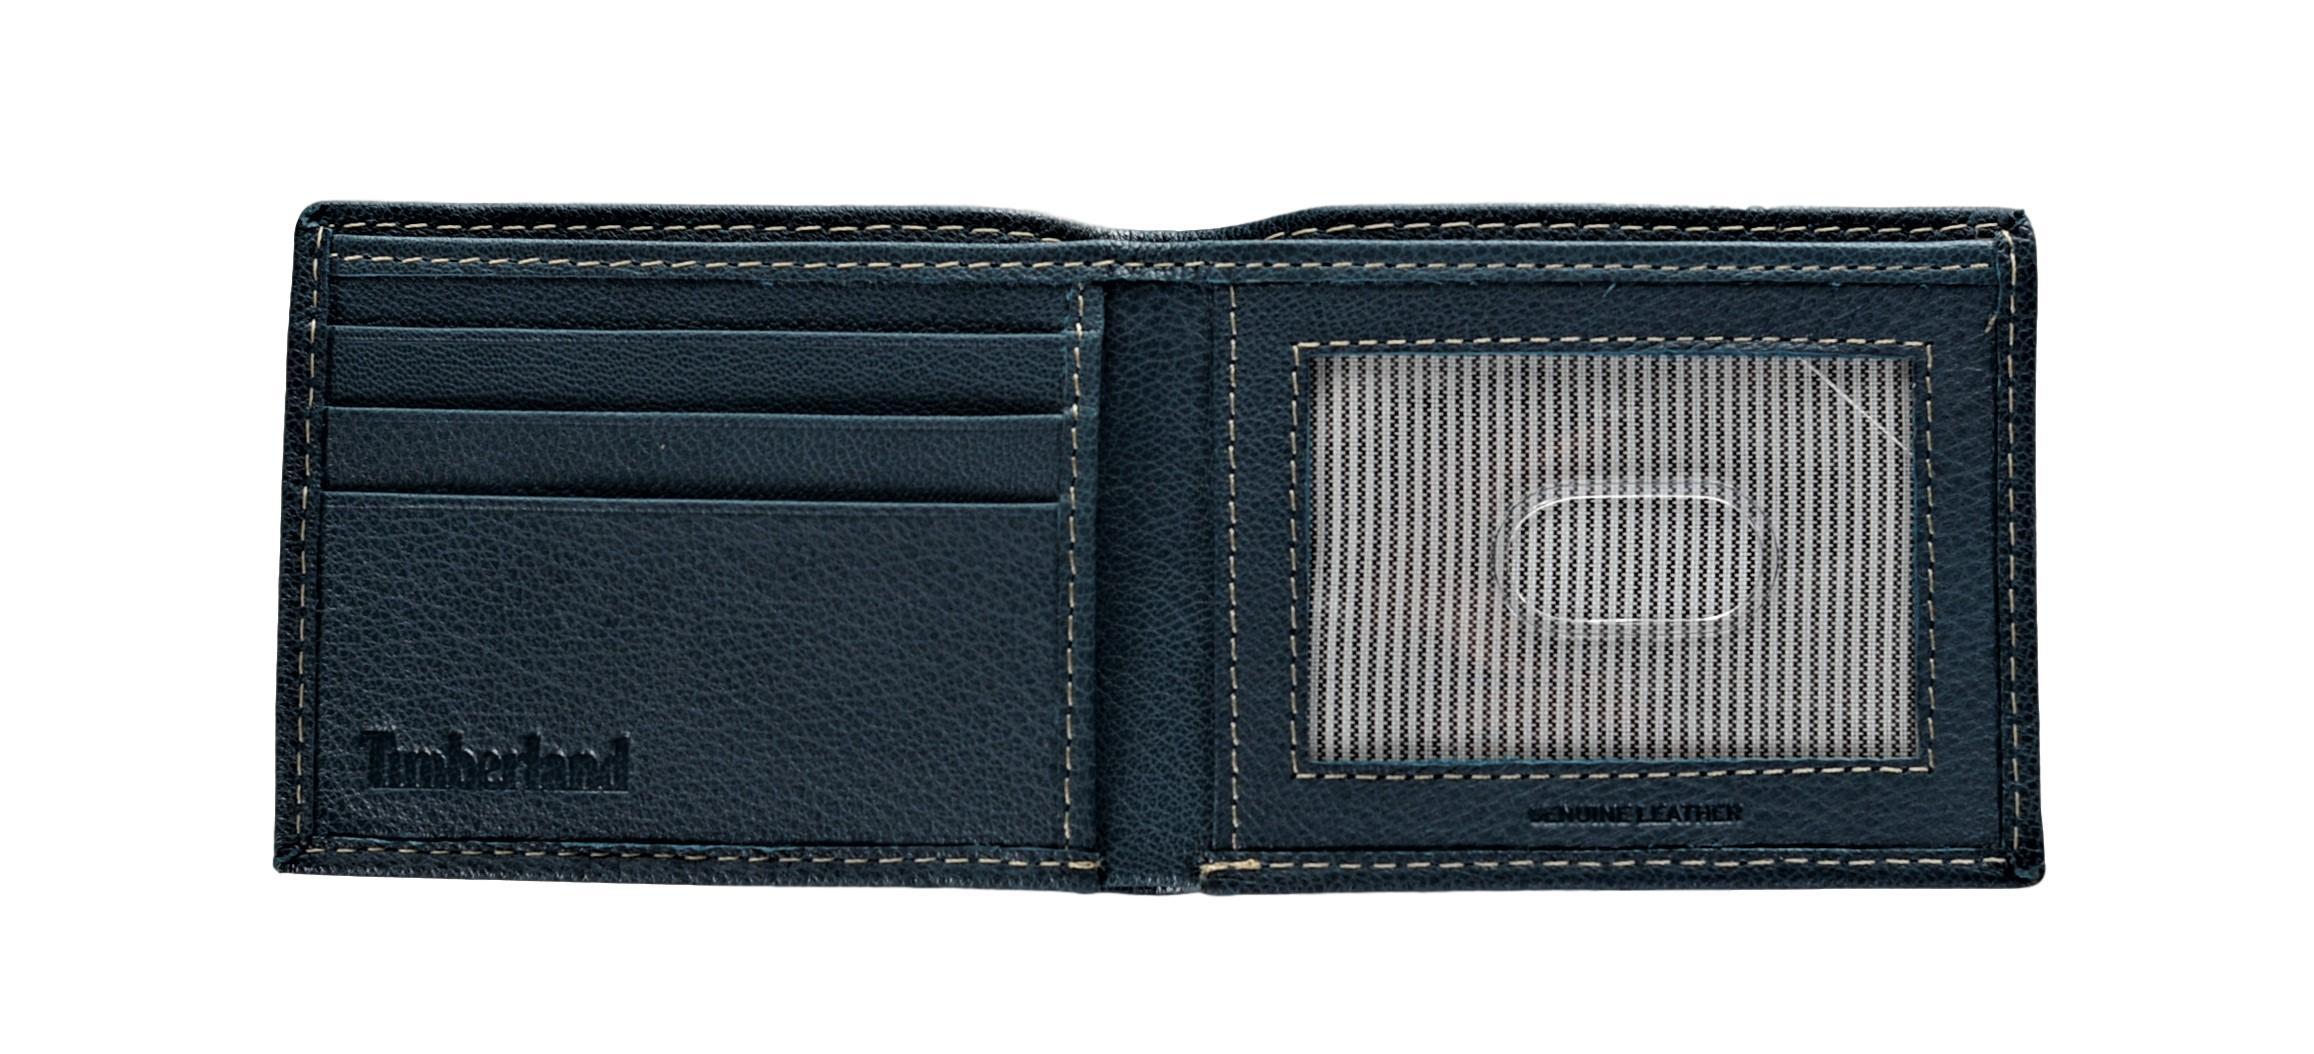 Timberland-Men-039-s-Blix-Slim-Bifold-Leather-Wallet thumbnail 16